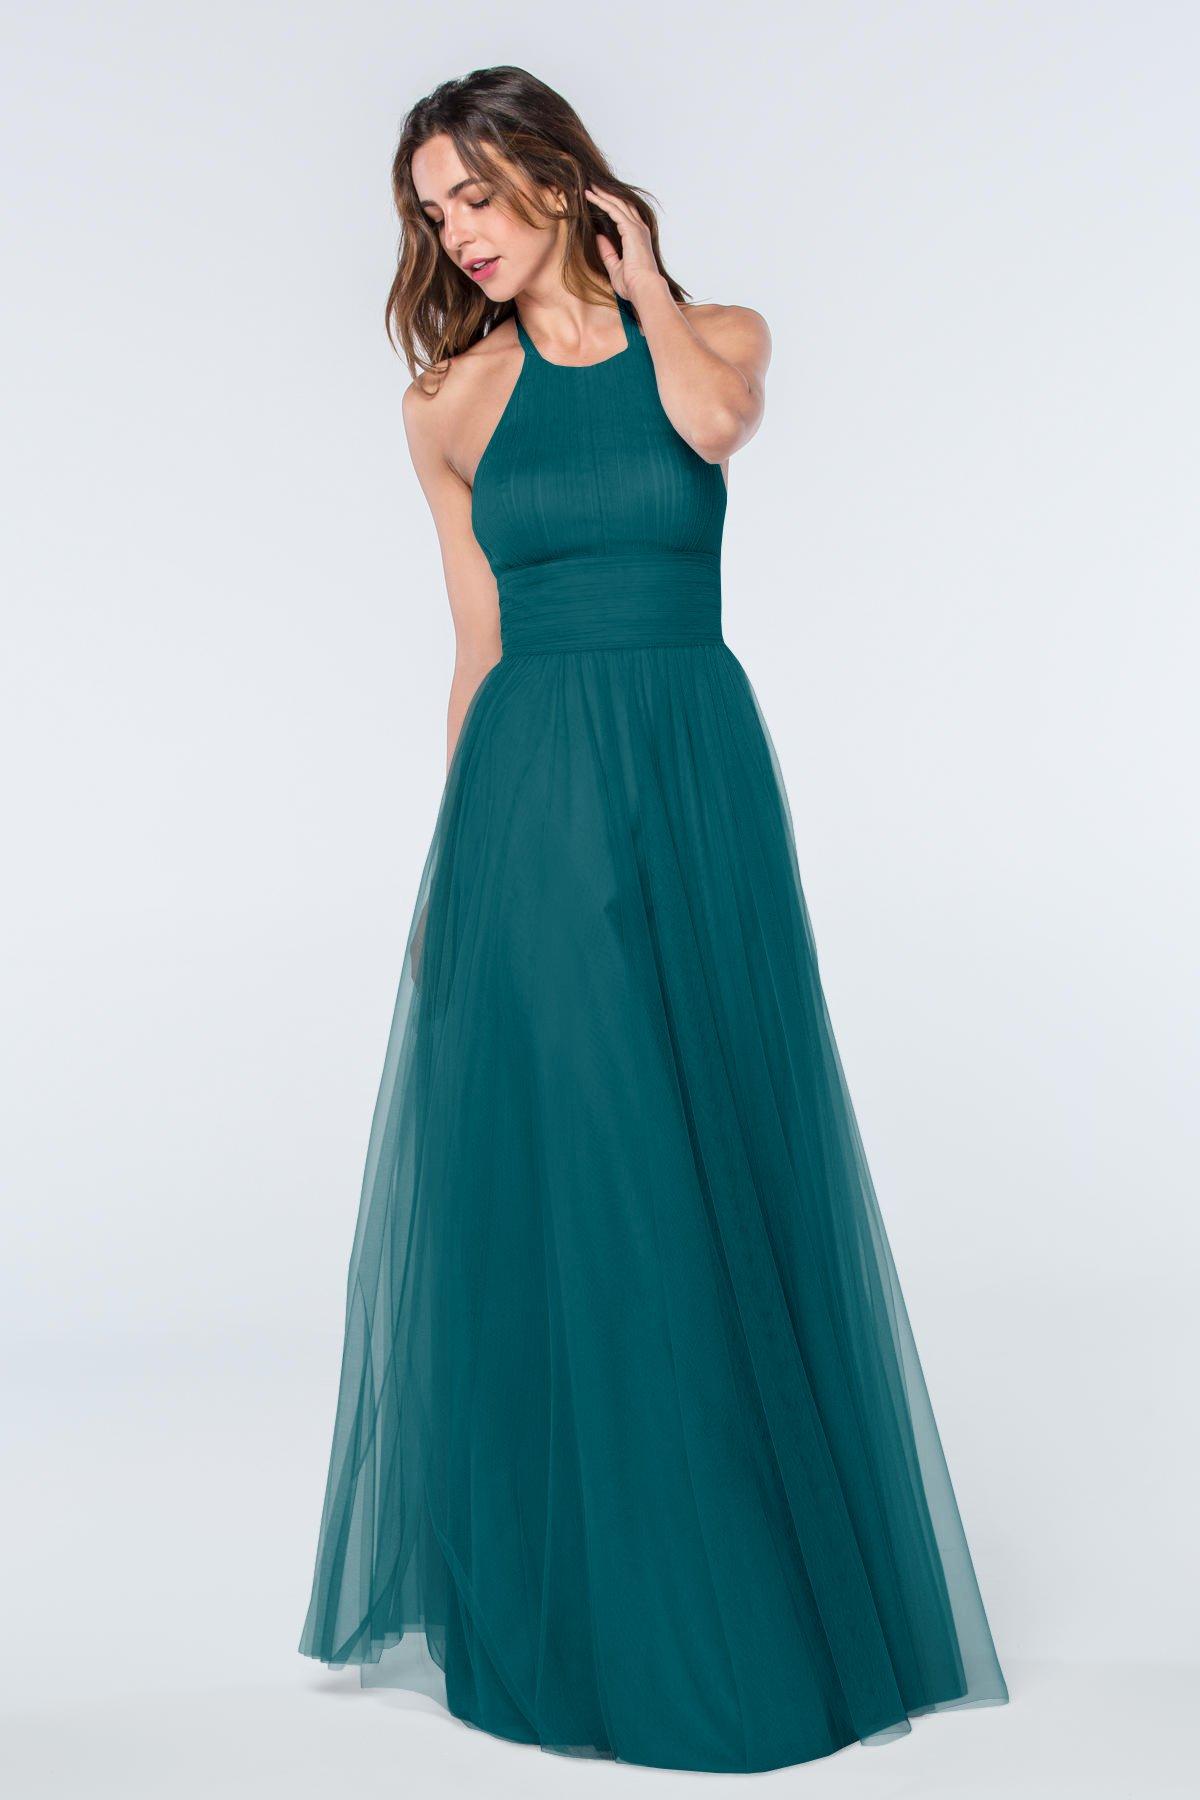 Viridian long bridesmaid dresses 2017